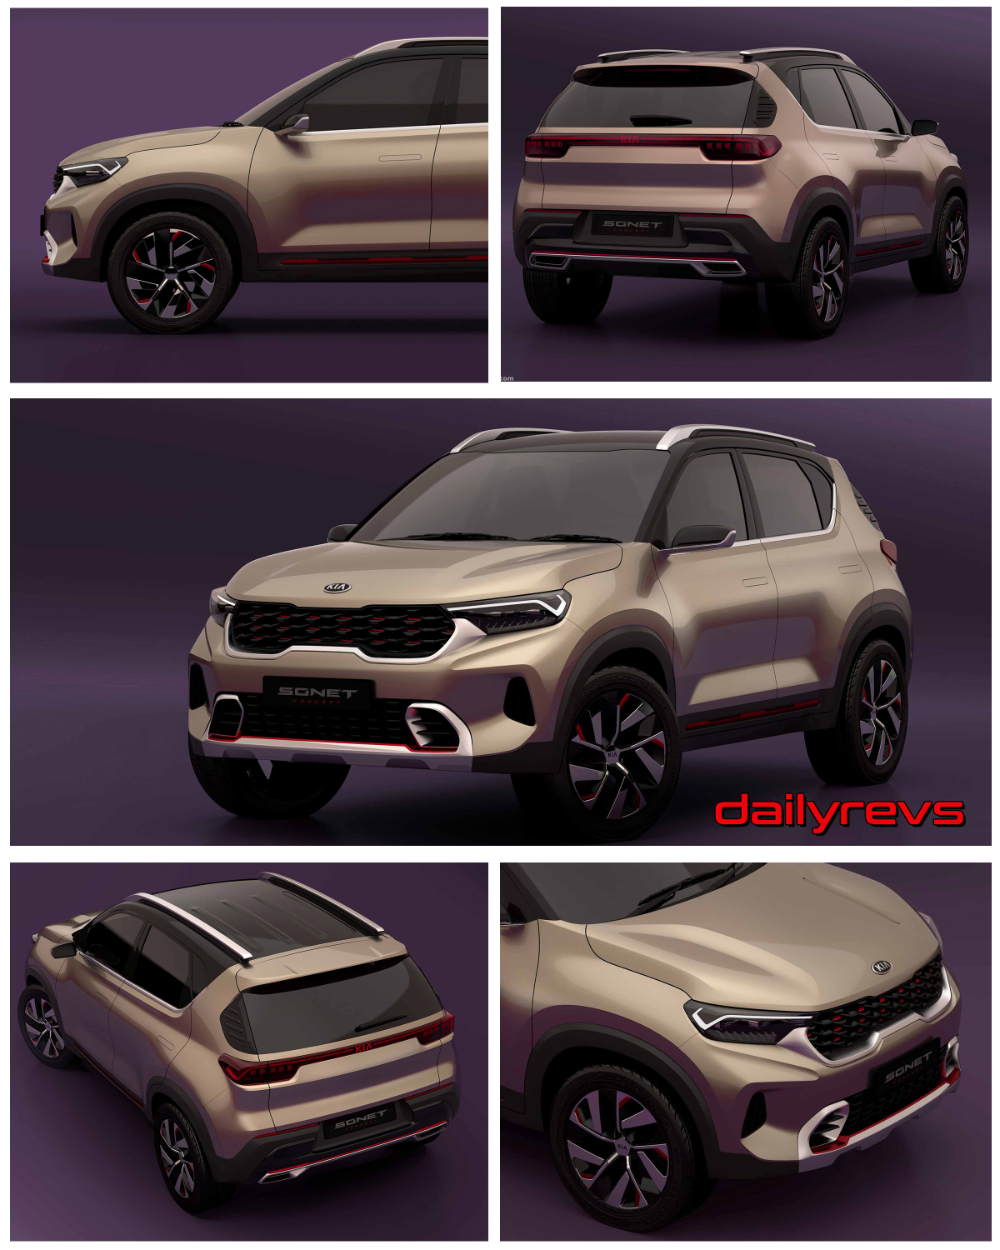 2020 Kia Concept in 2020 Kia, Kia